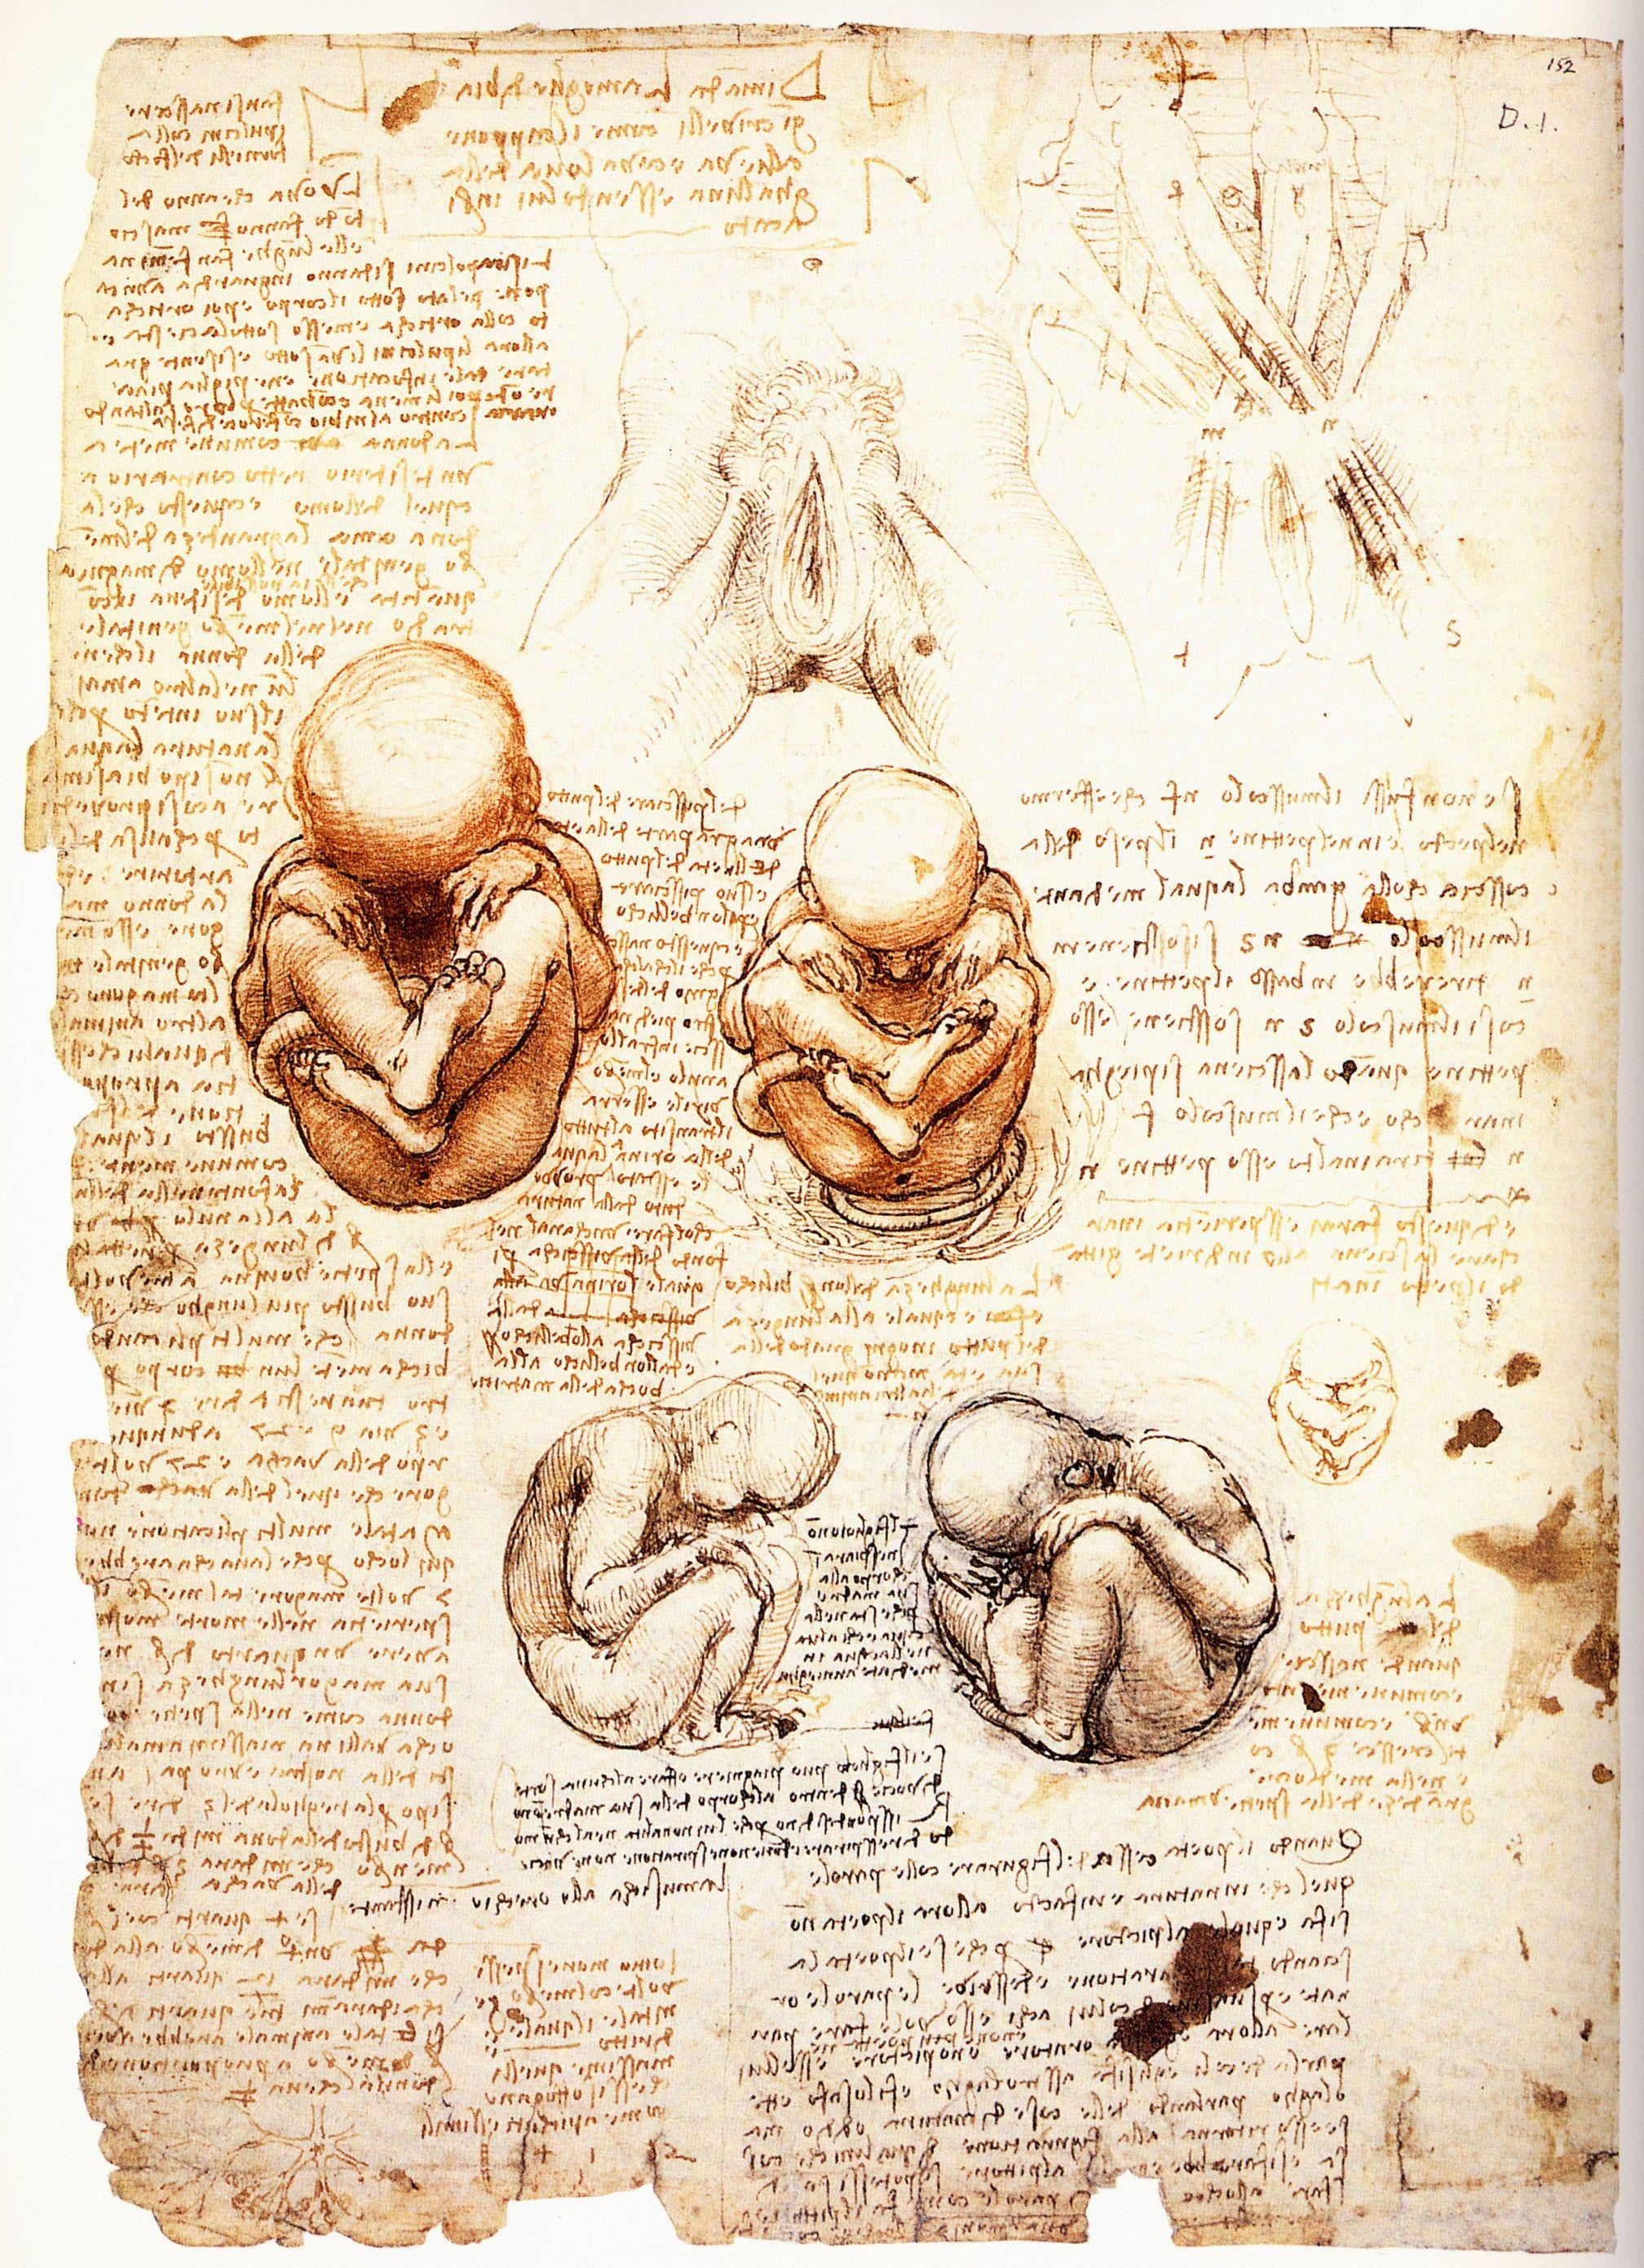 Amazing drawings by Leonardo da Vinci